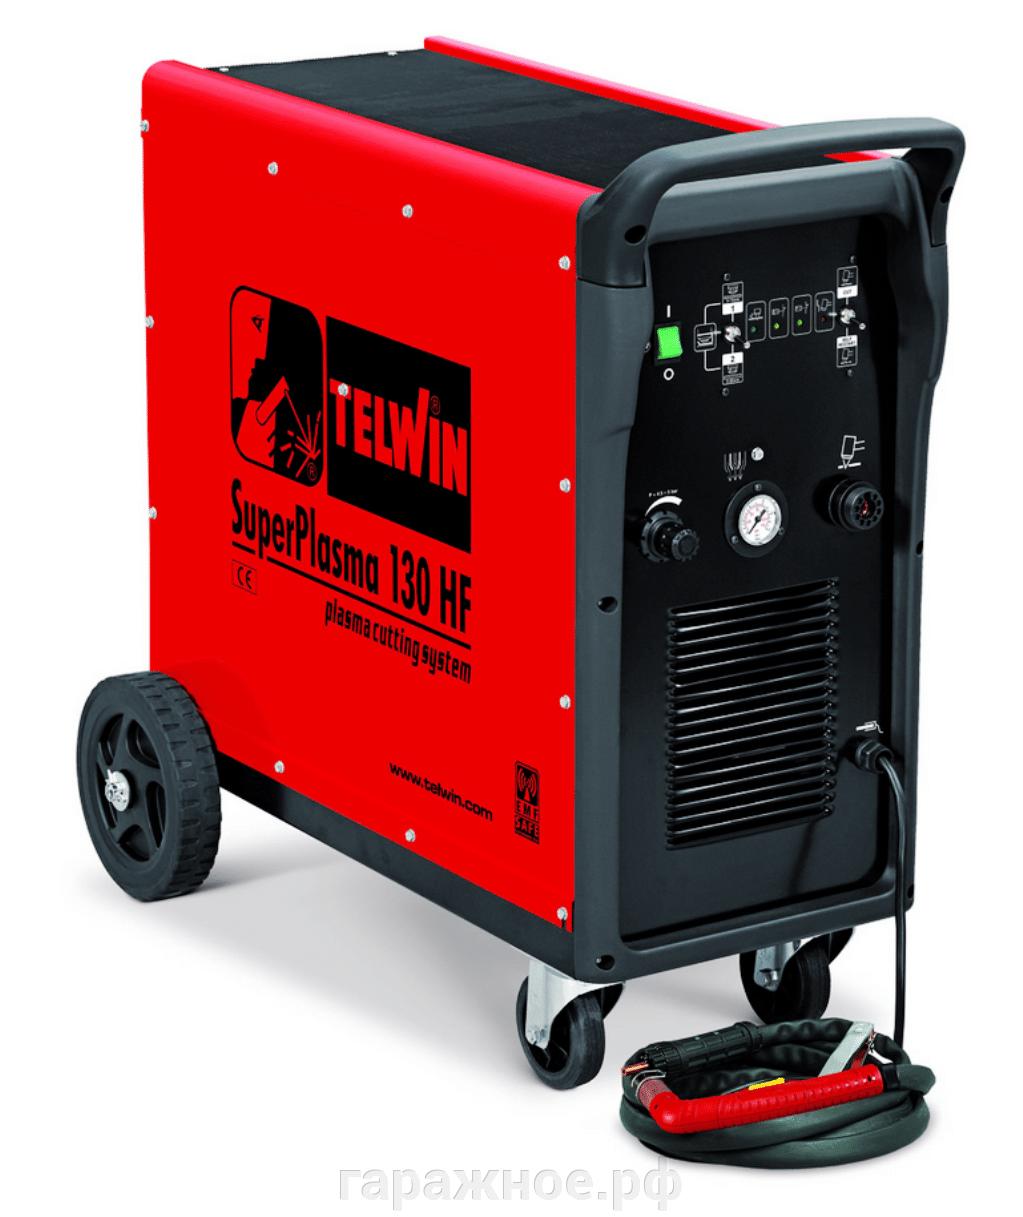 Аппарат плазменной резки Telwin Superplasma 130 HF